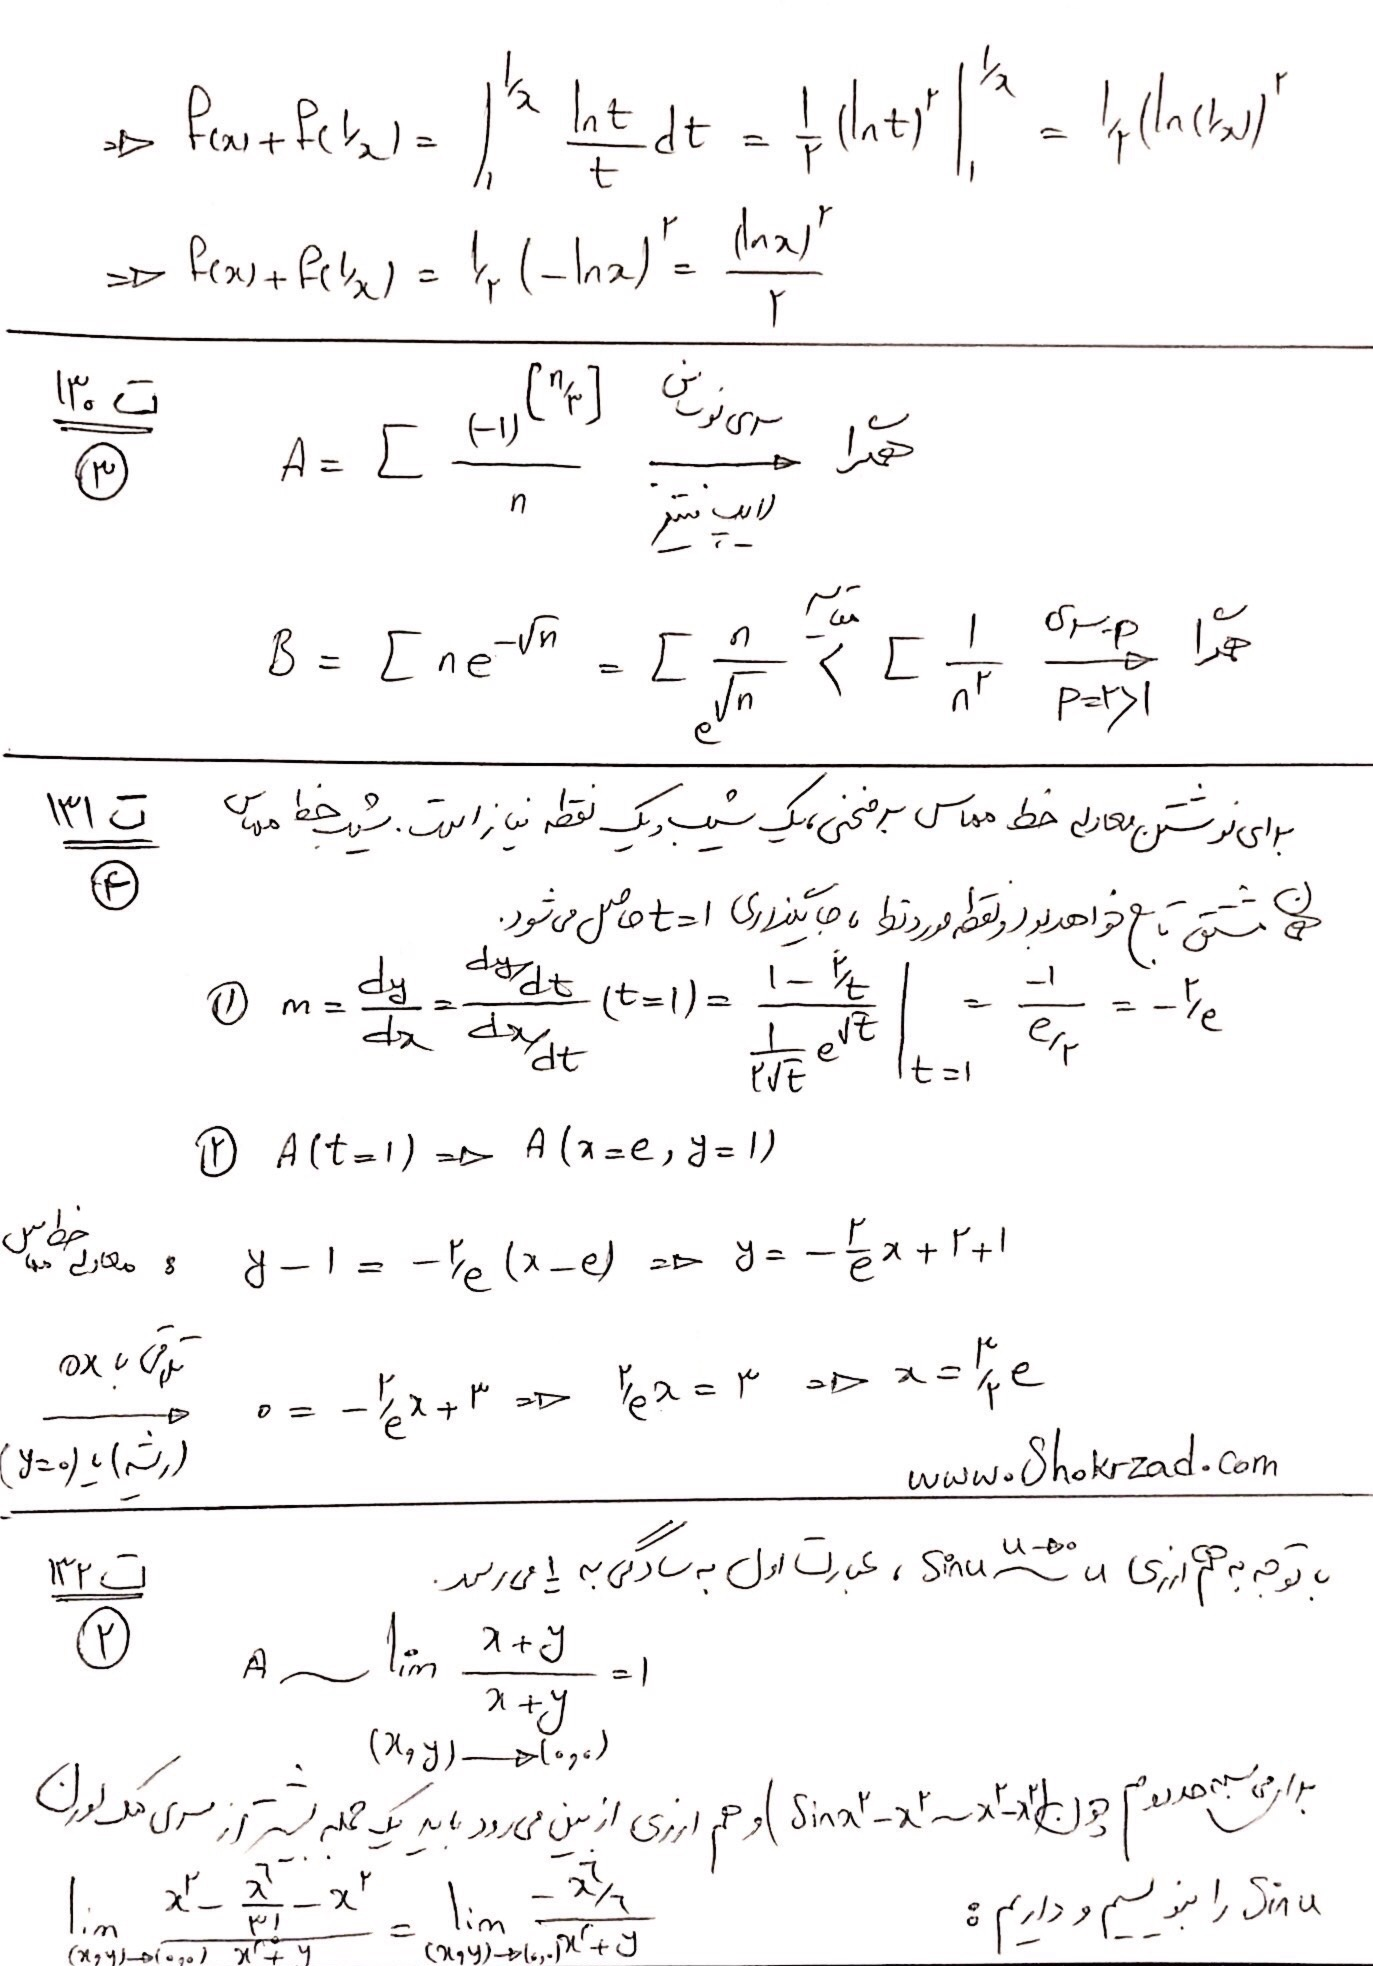 پاسخ ریاضی صنایع ارشد 95